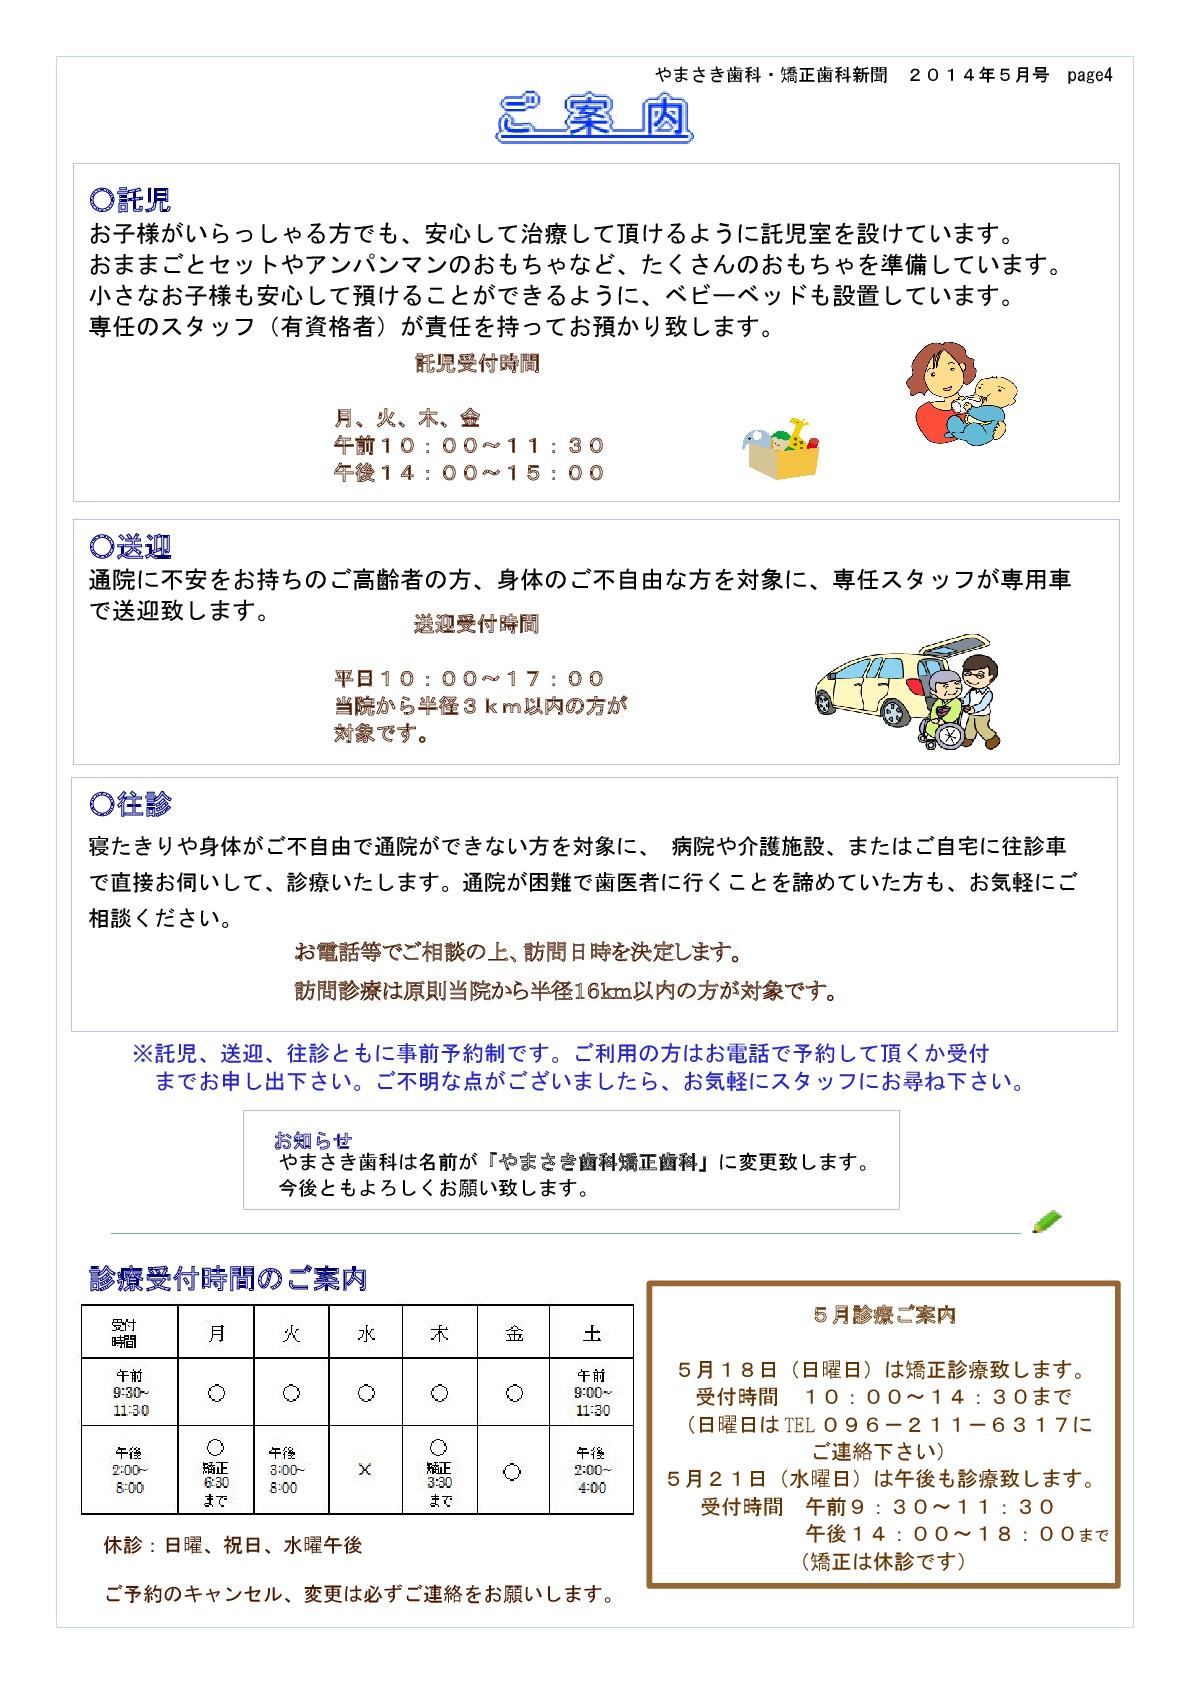 sinbun14-5-2-003